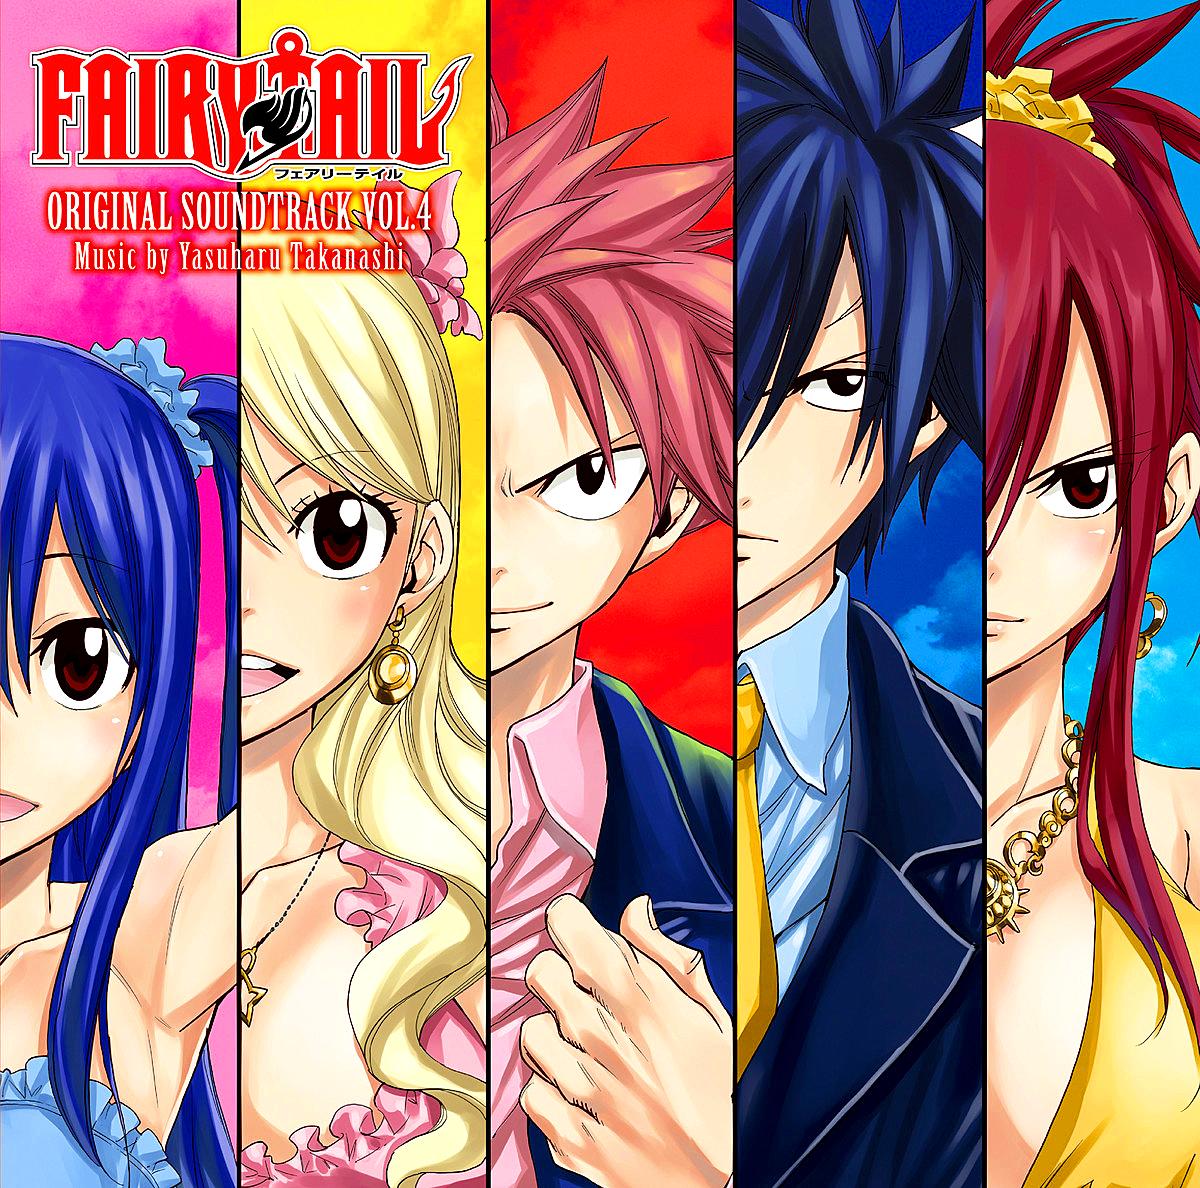 Fairy tail svg black and white stock Fairy Tail Original Soundtrack Vol. 4 | Fairy Tail Wiki | Fandom ... svg black and white stock